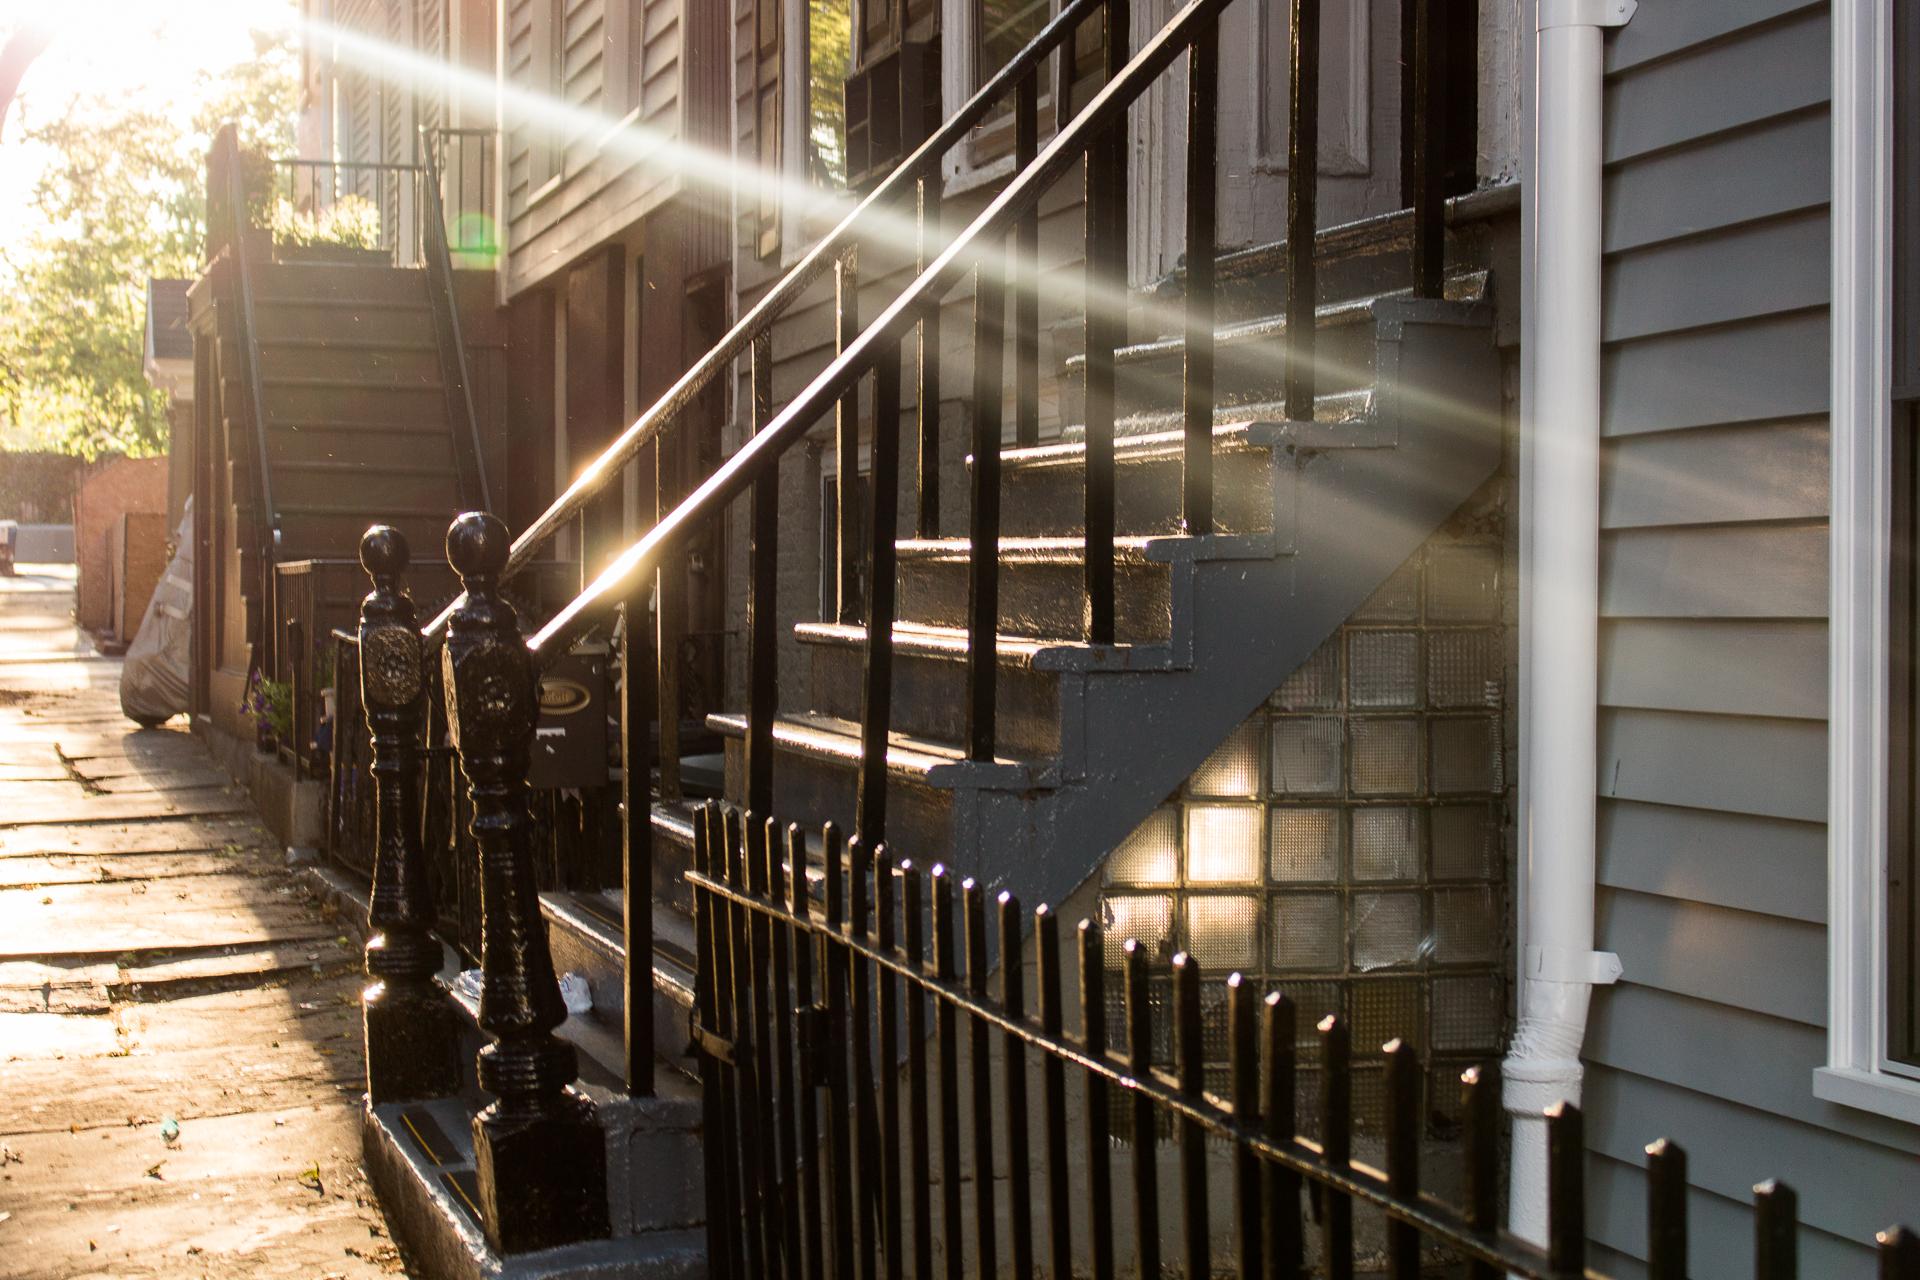 BrooklynHeights.jpg